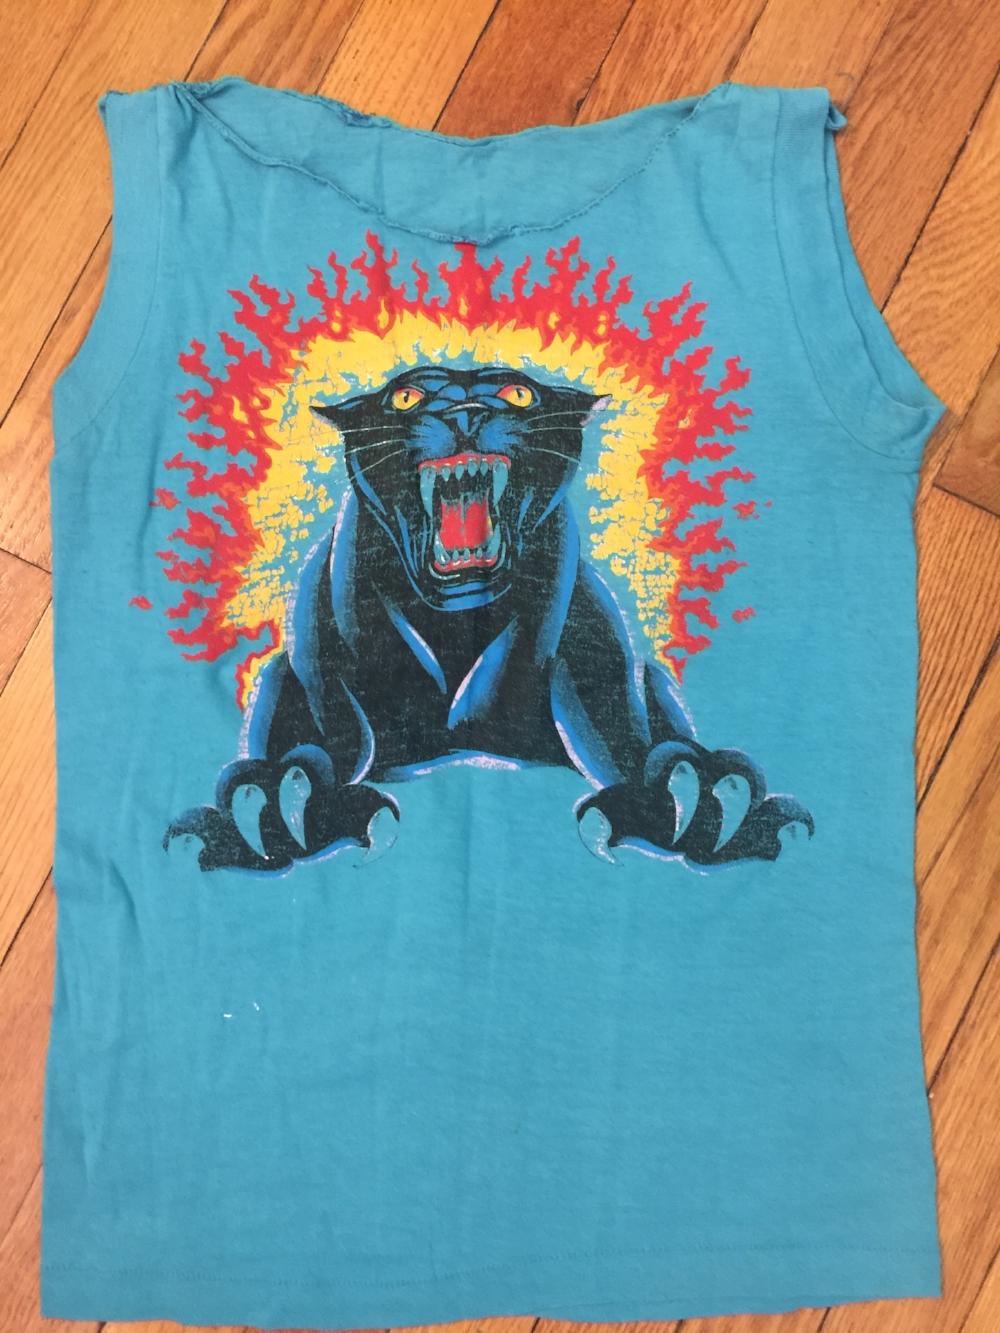 Rae's signature shirt from RISD